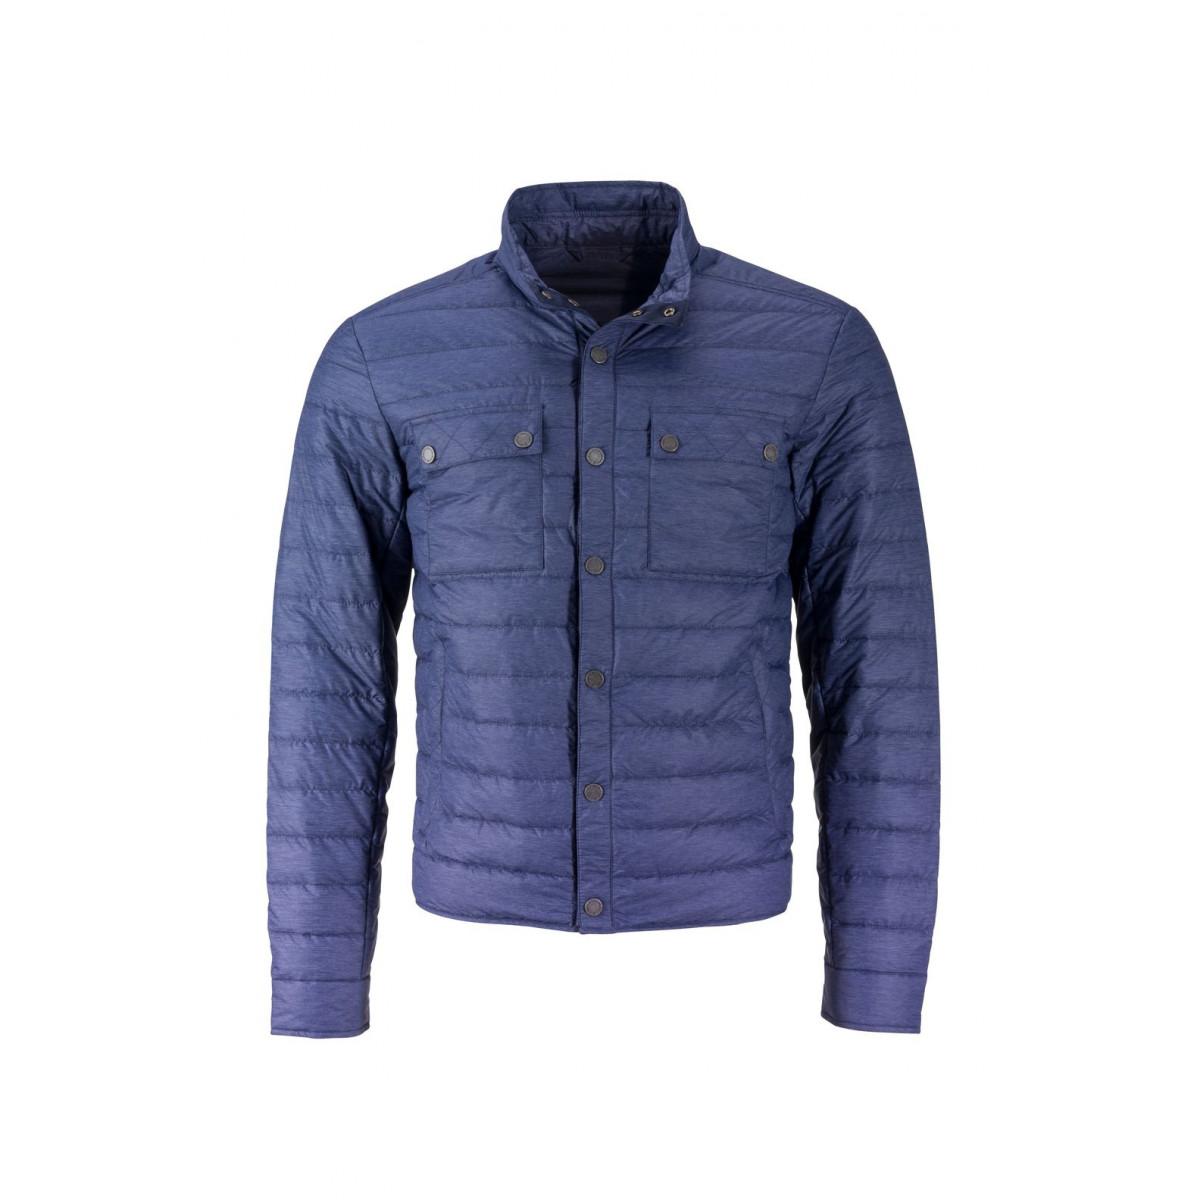 Куртка мужская JN1106 Mens Lightweight Down Jacket - Темно-синий меланж